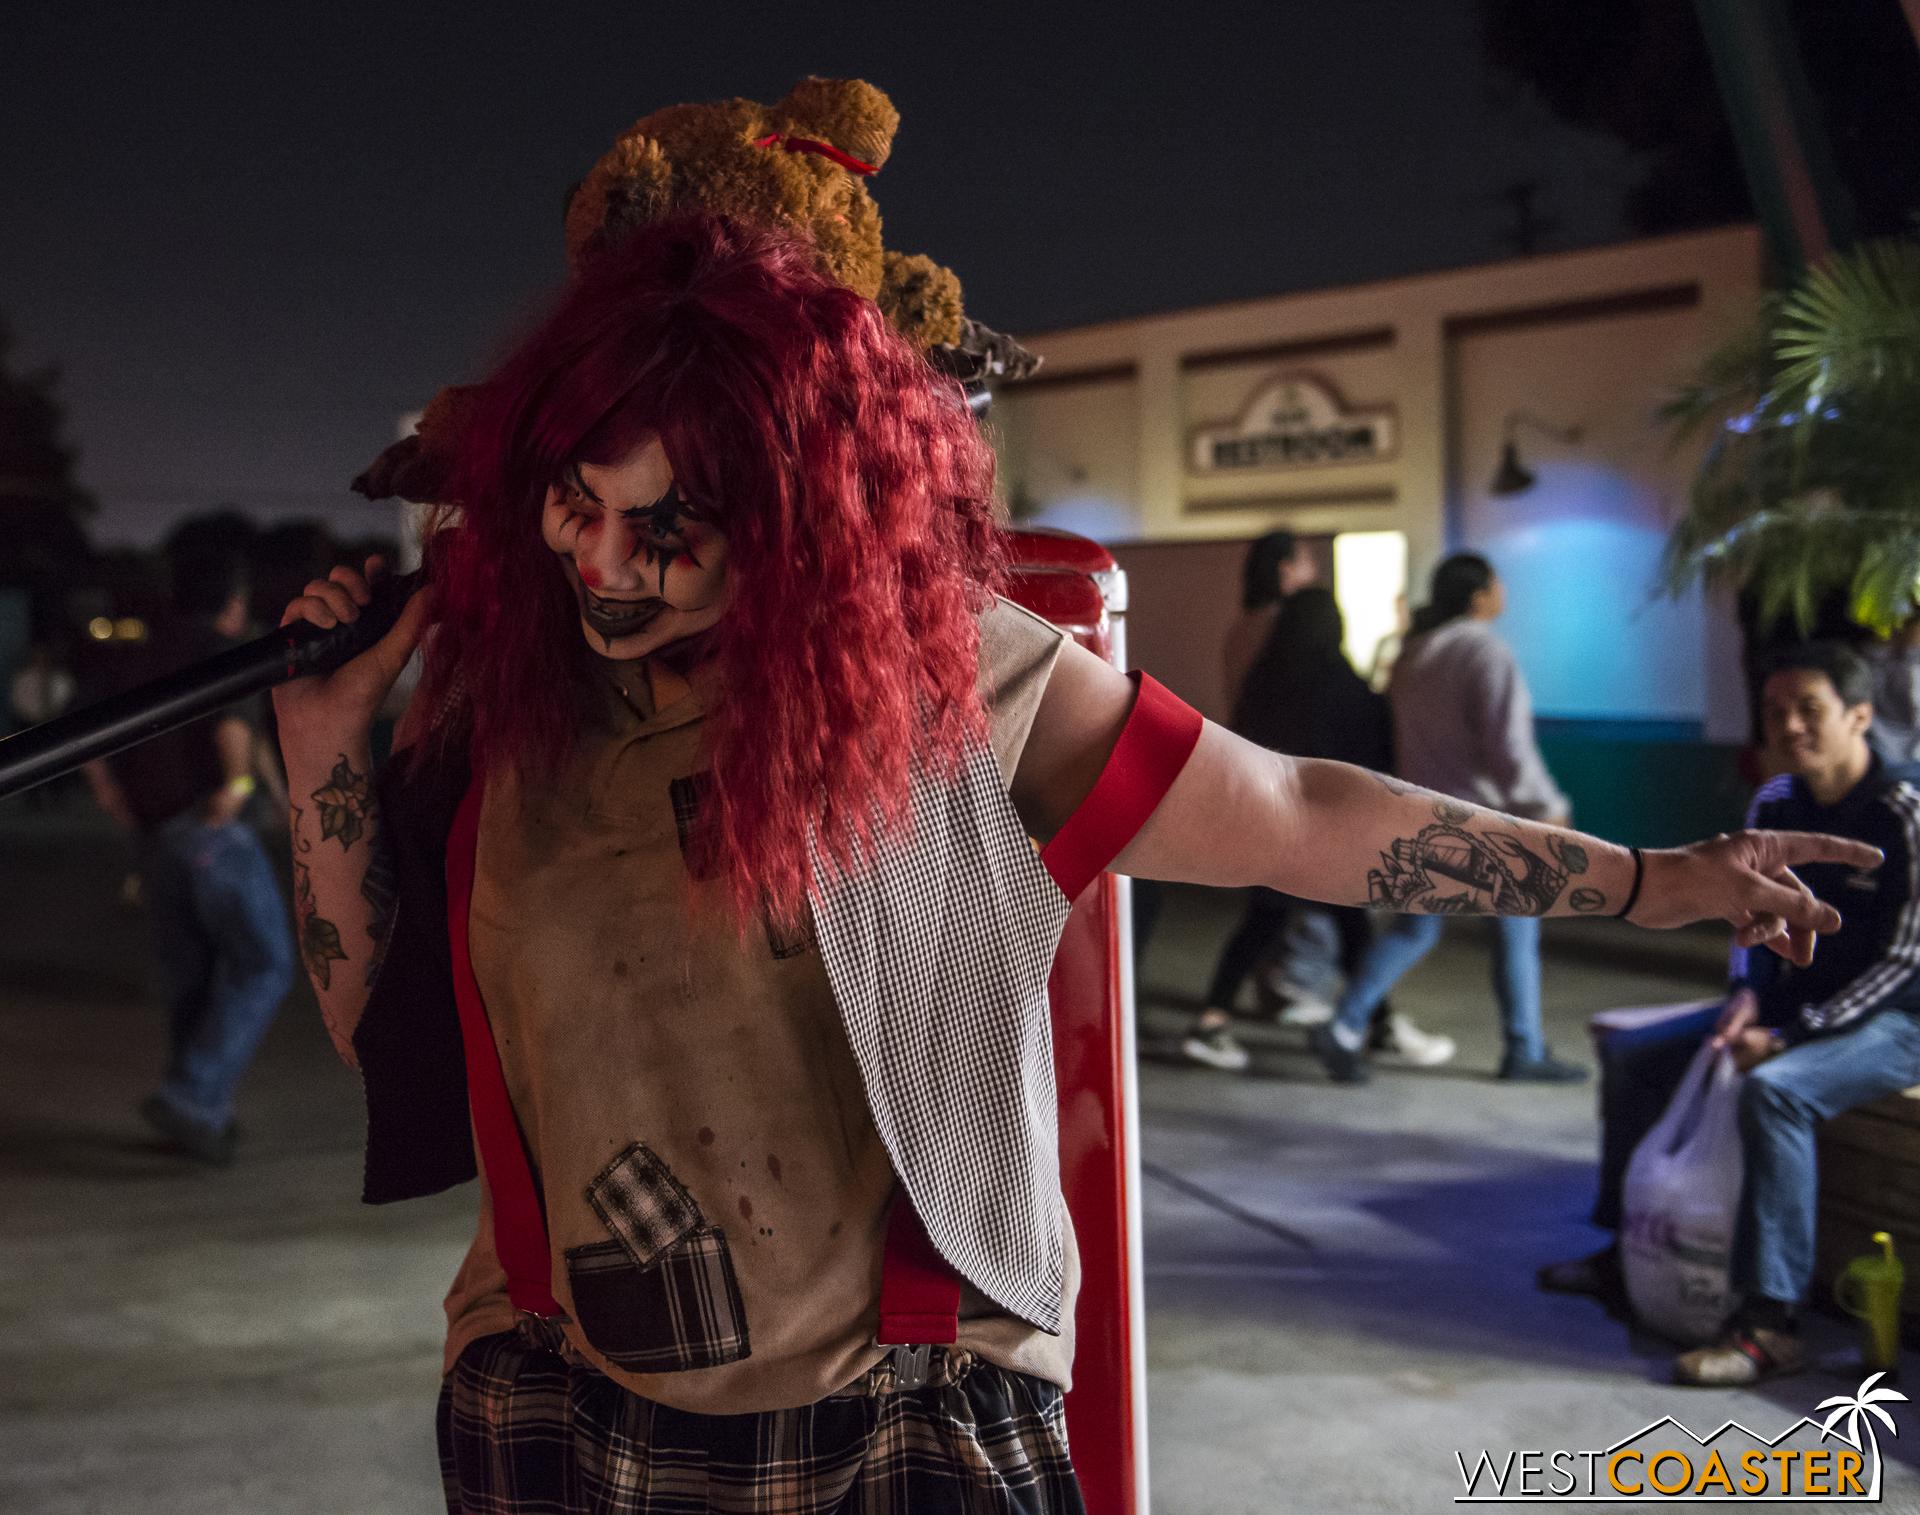 I love this clown's stuff animal on a stick.